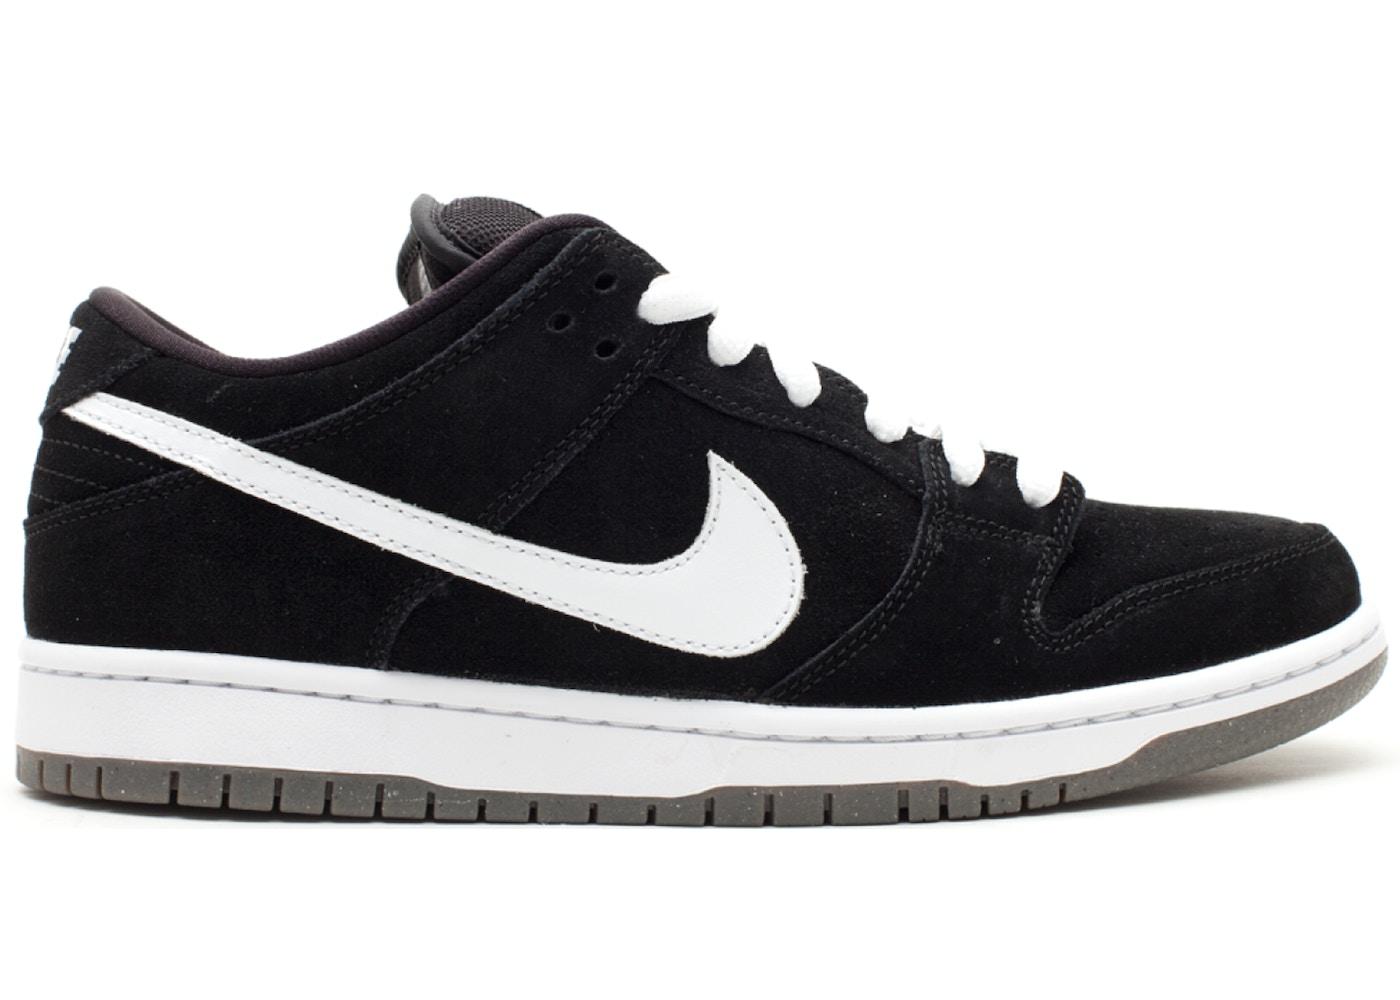 Nike SB Dunk Low Black White (2011)